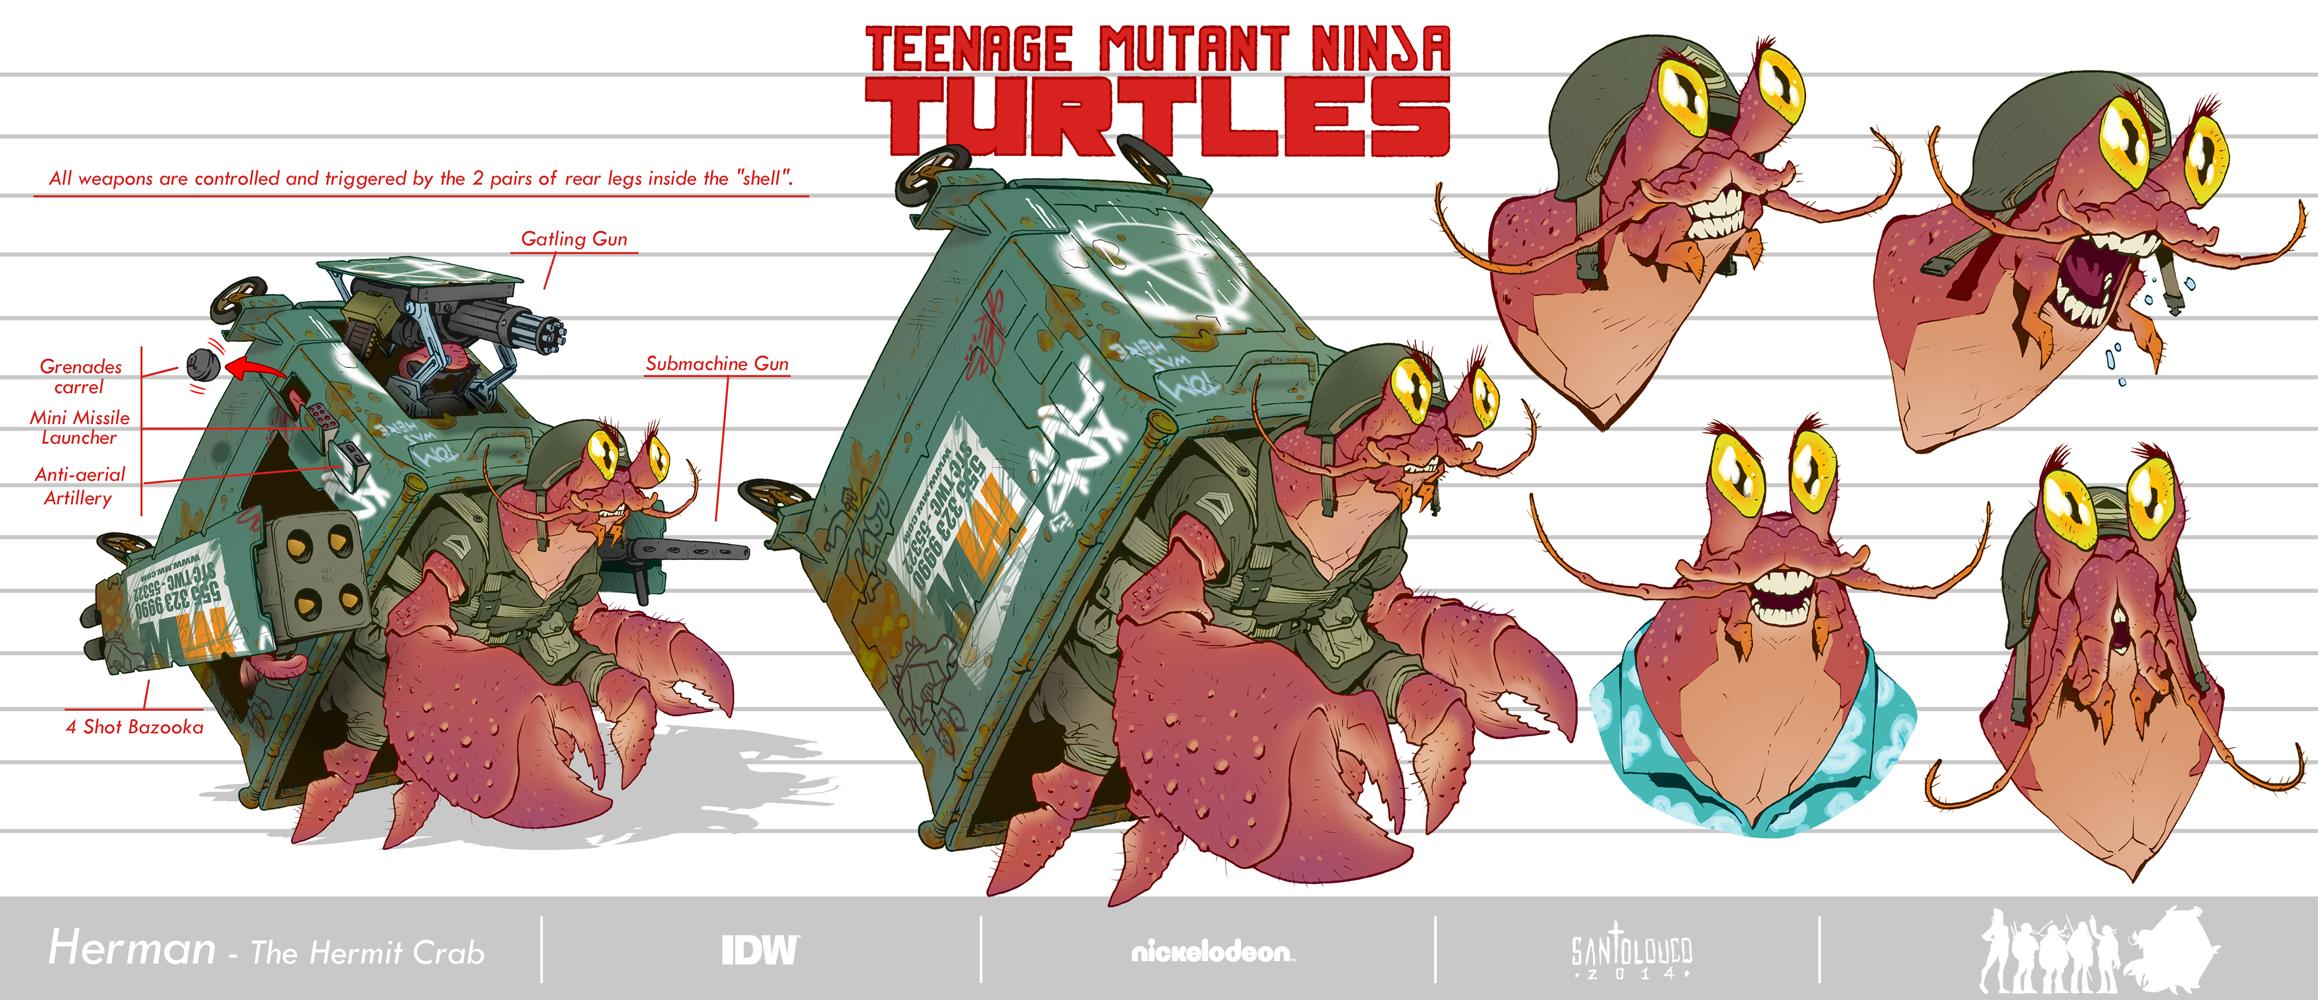 Herman-The Hermit Crab_TMNT_Design by Santolouco